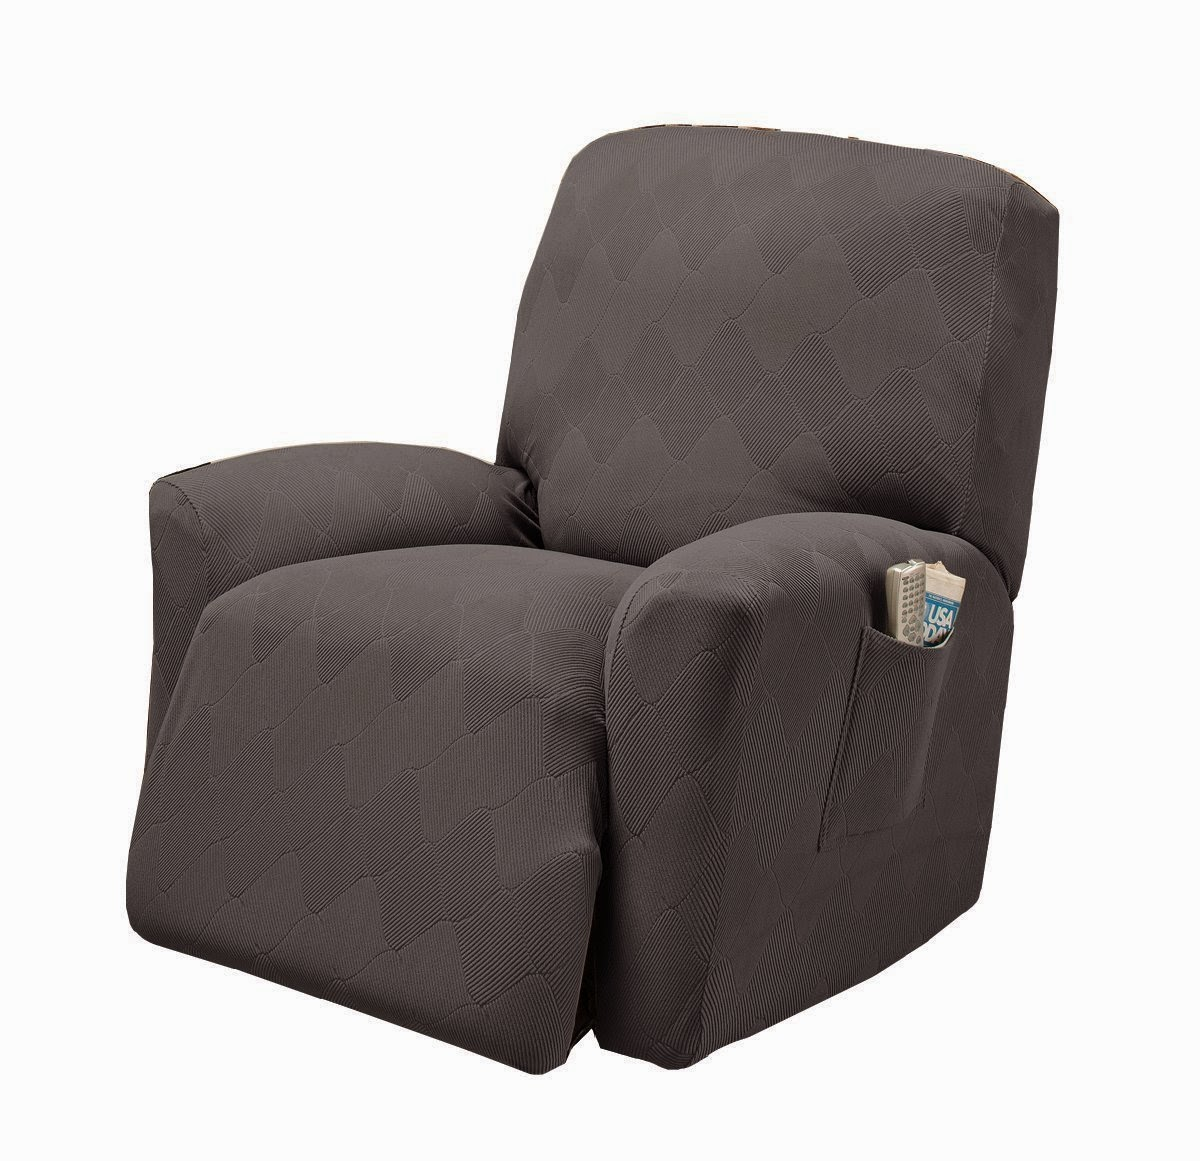 Recliner Sofa Slipcovers Walmart Reviews